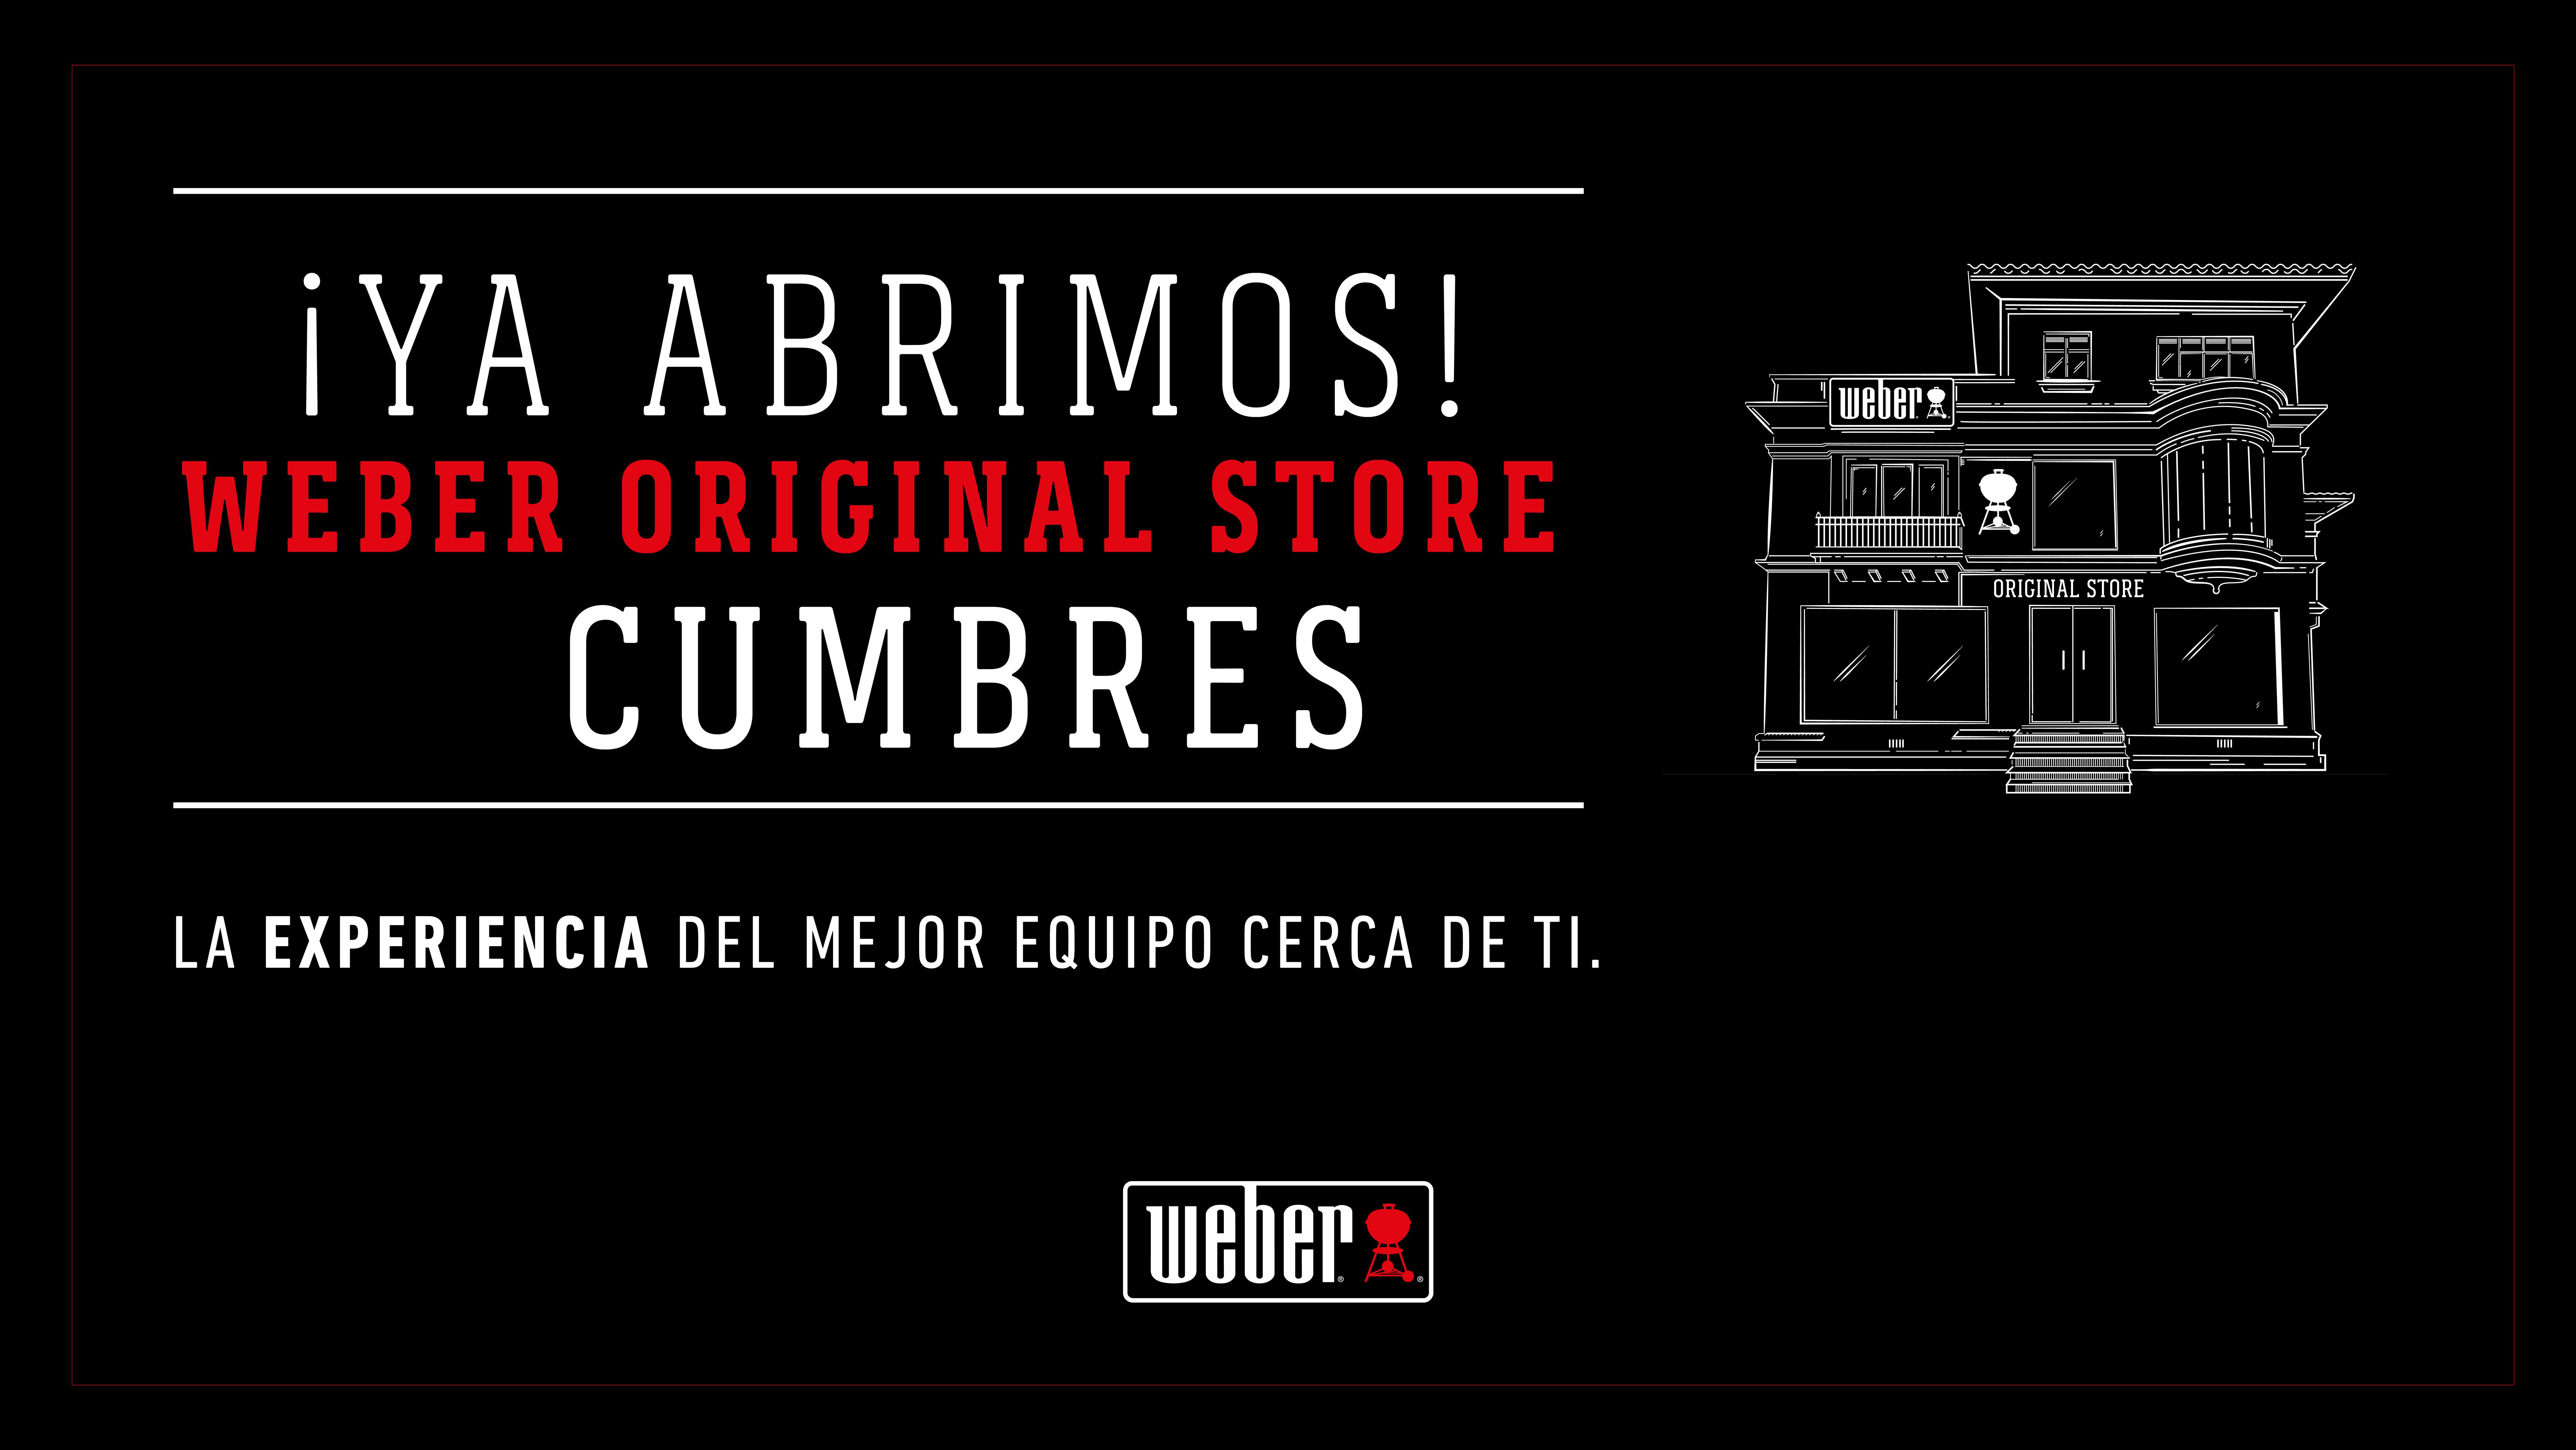 Weber Original Store Cumbres